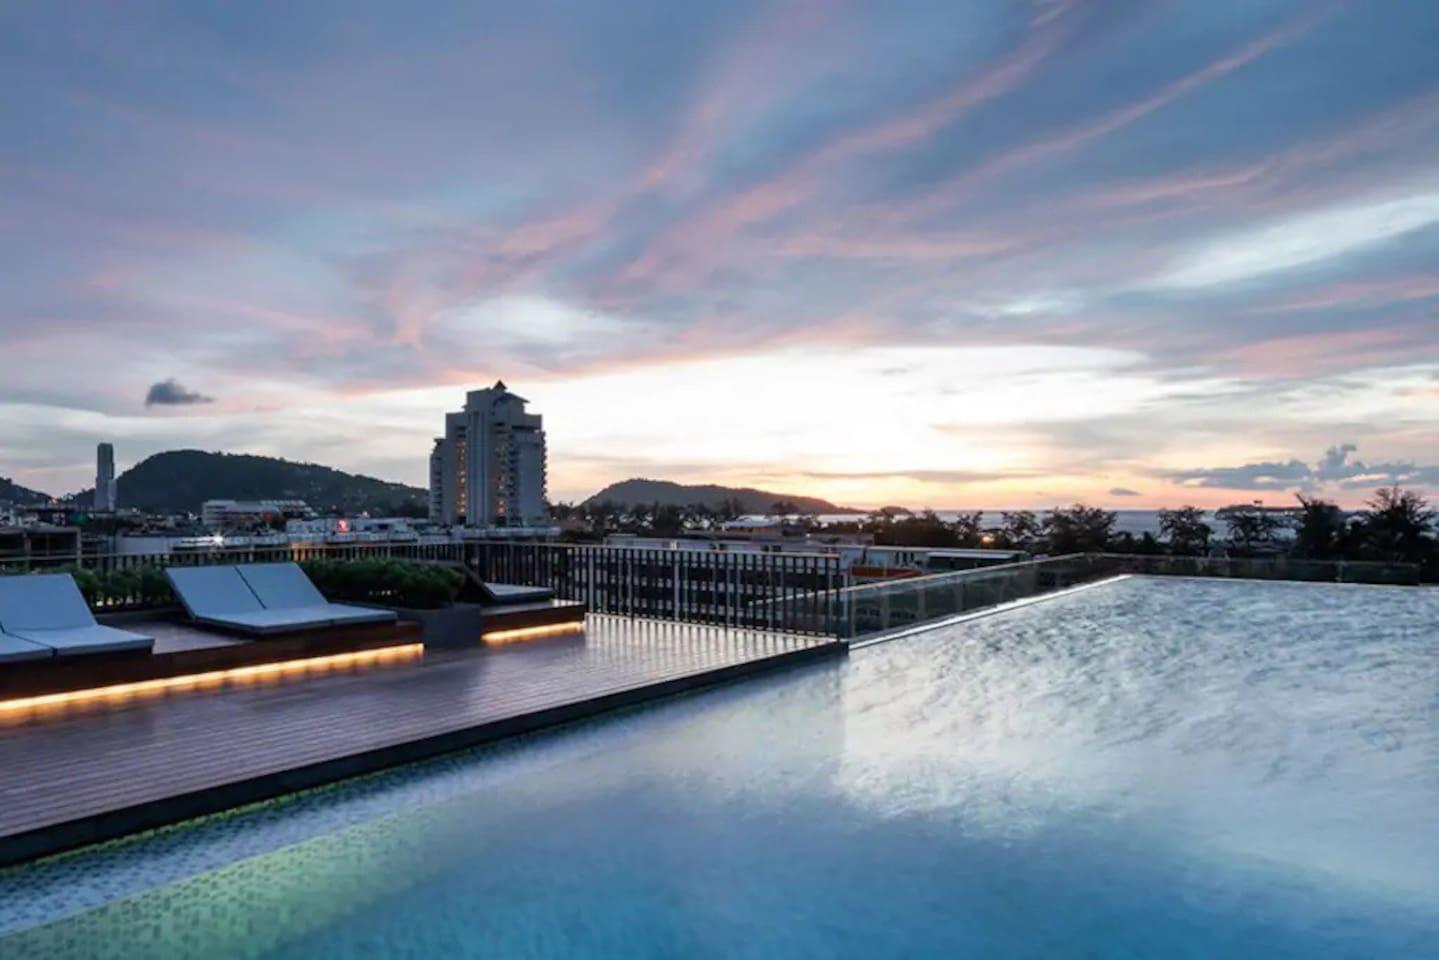 Two Bedrooms & roof top pool at Patong Beach #D28 2 ห้องนอน 1 ห้องน้ำส่วนตัว ขนาด 40 ตร.ม. – ป่าตอง